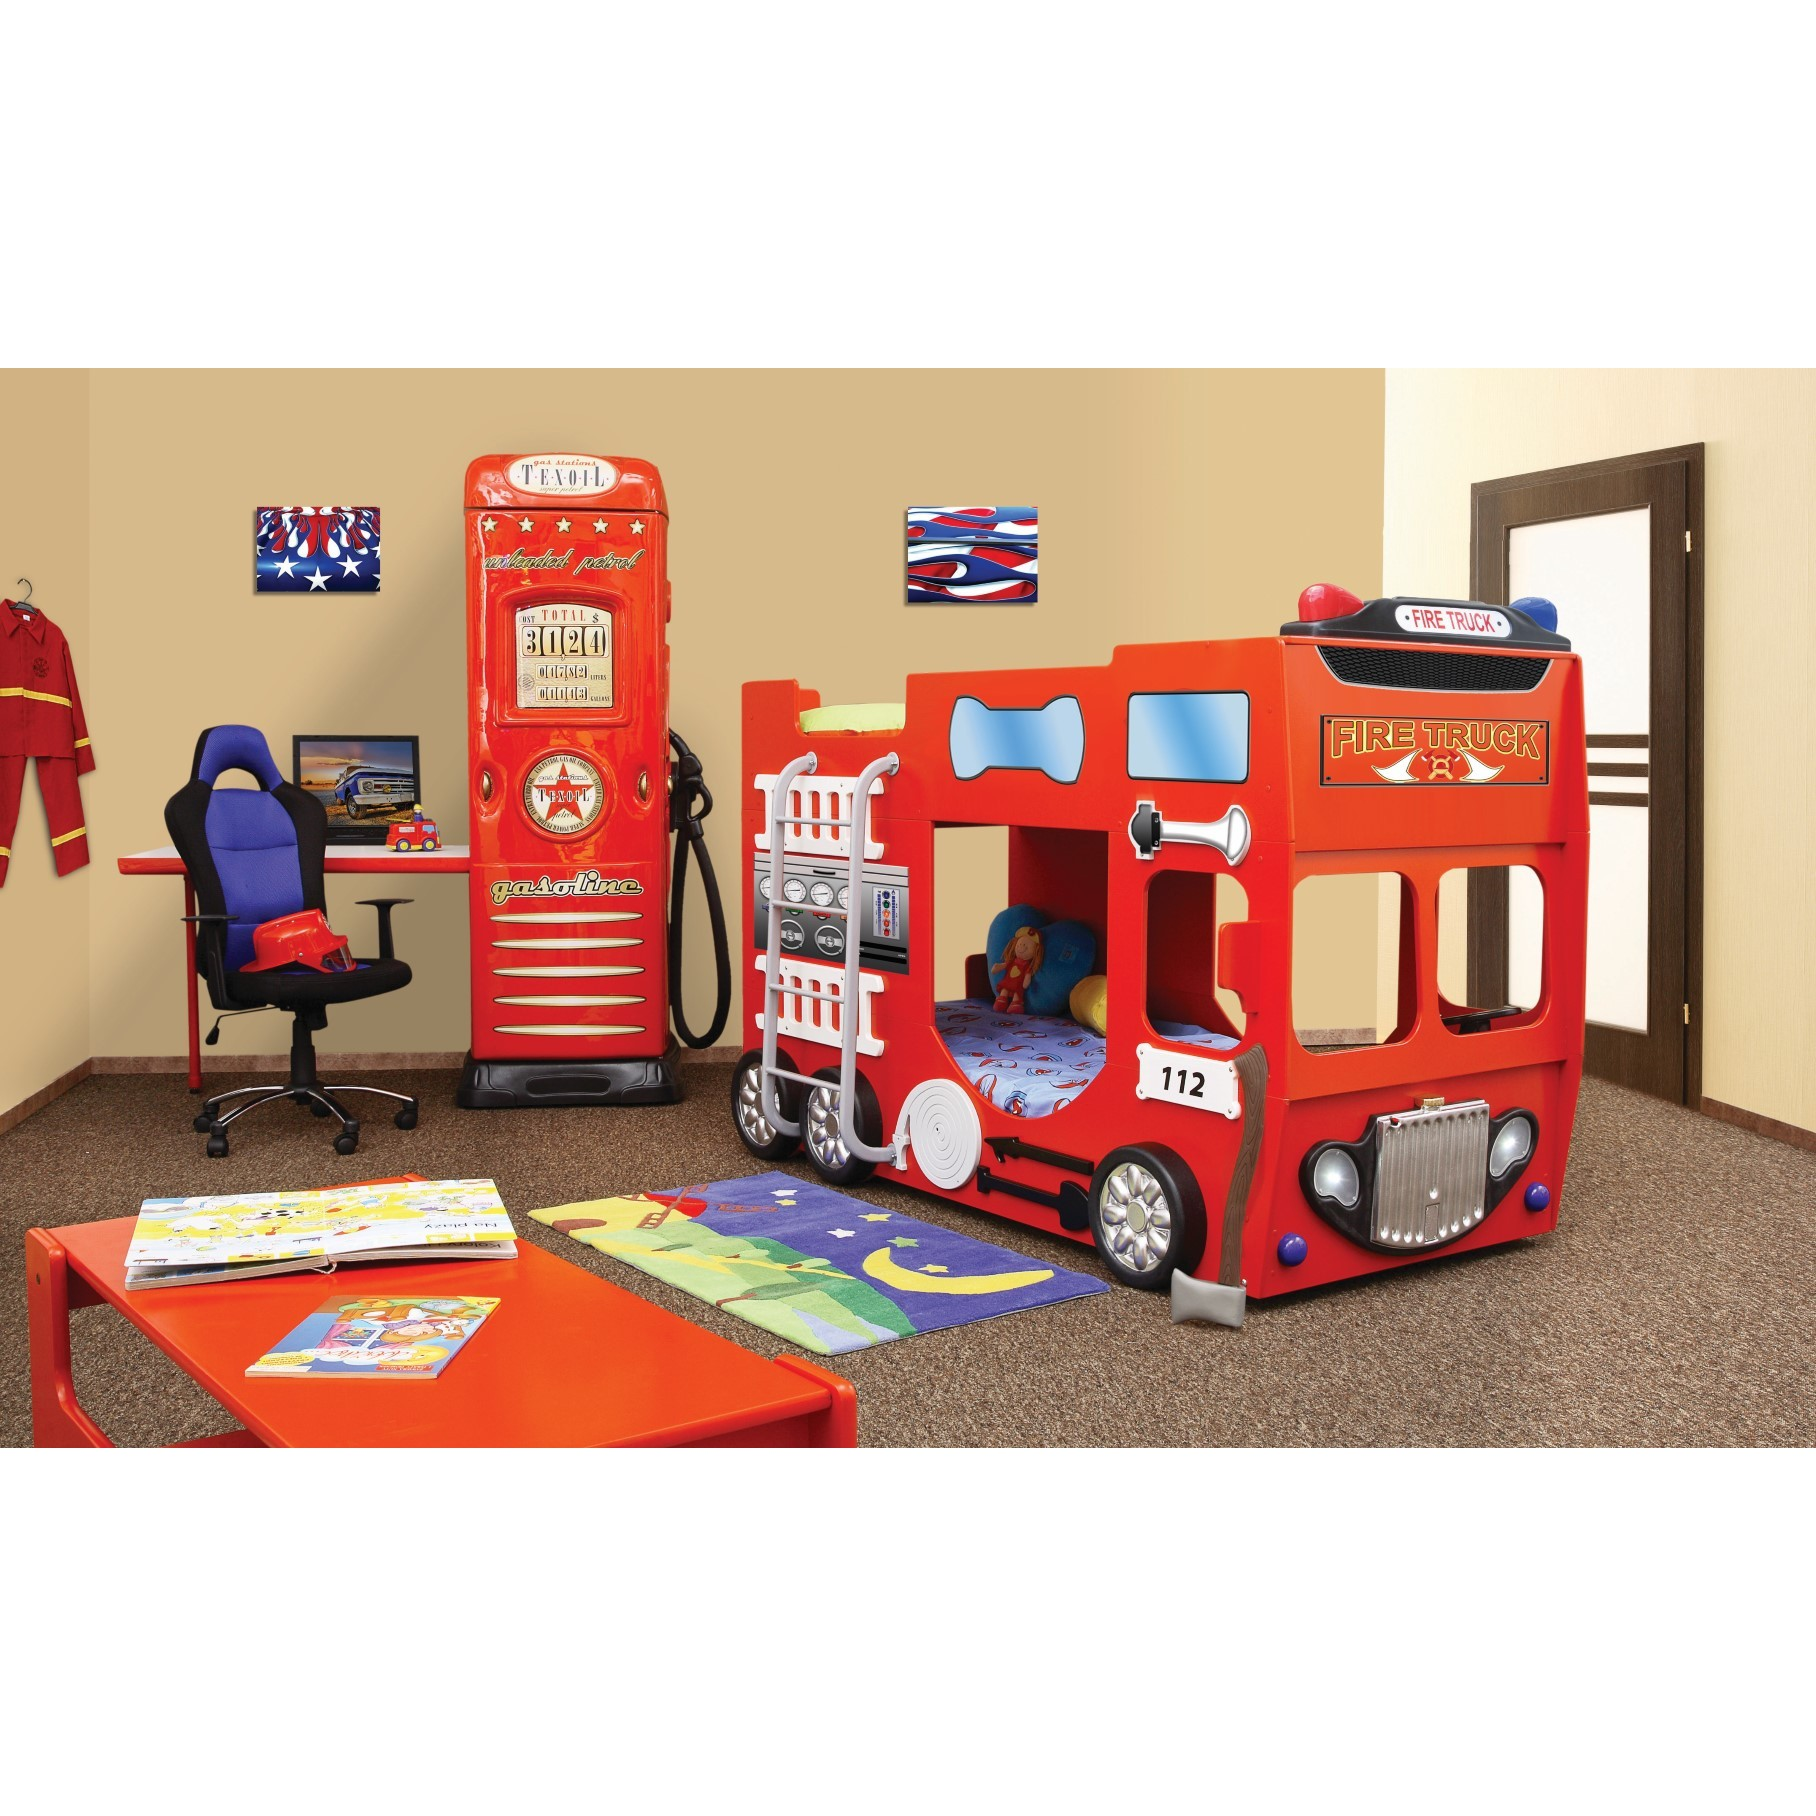 Brandweer Auto Stapelbed.Brandweerbed Stapelbed Voor De Kinderkamer Kinderkamer